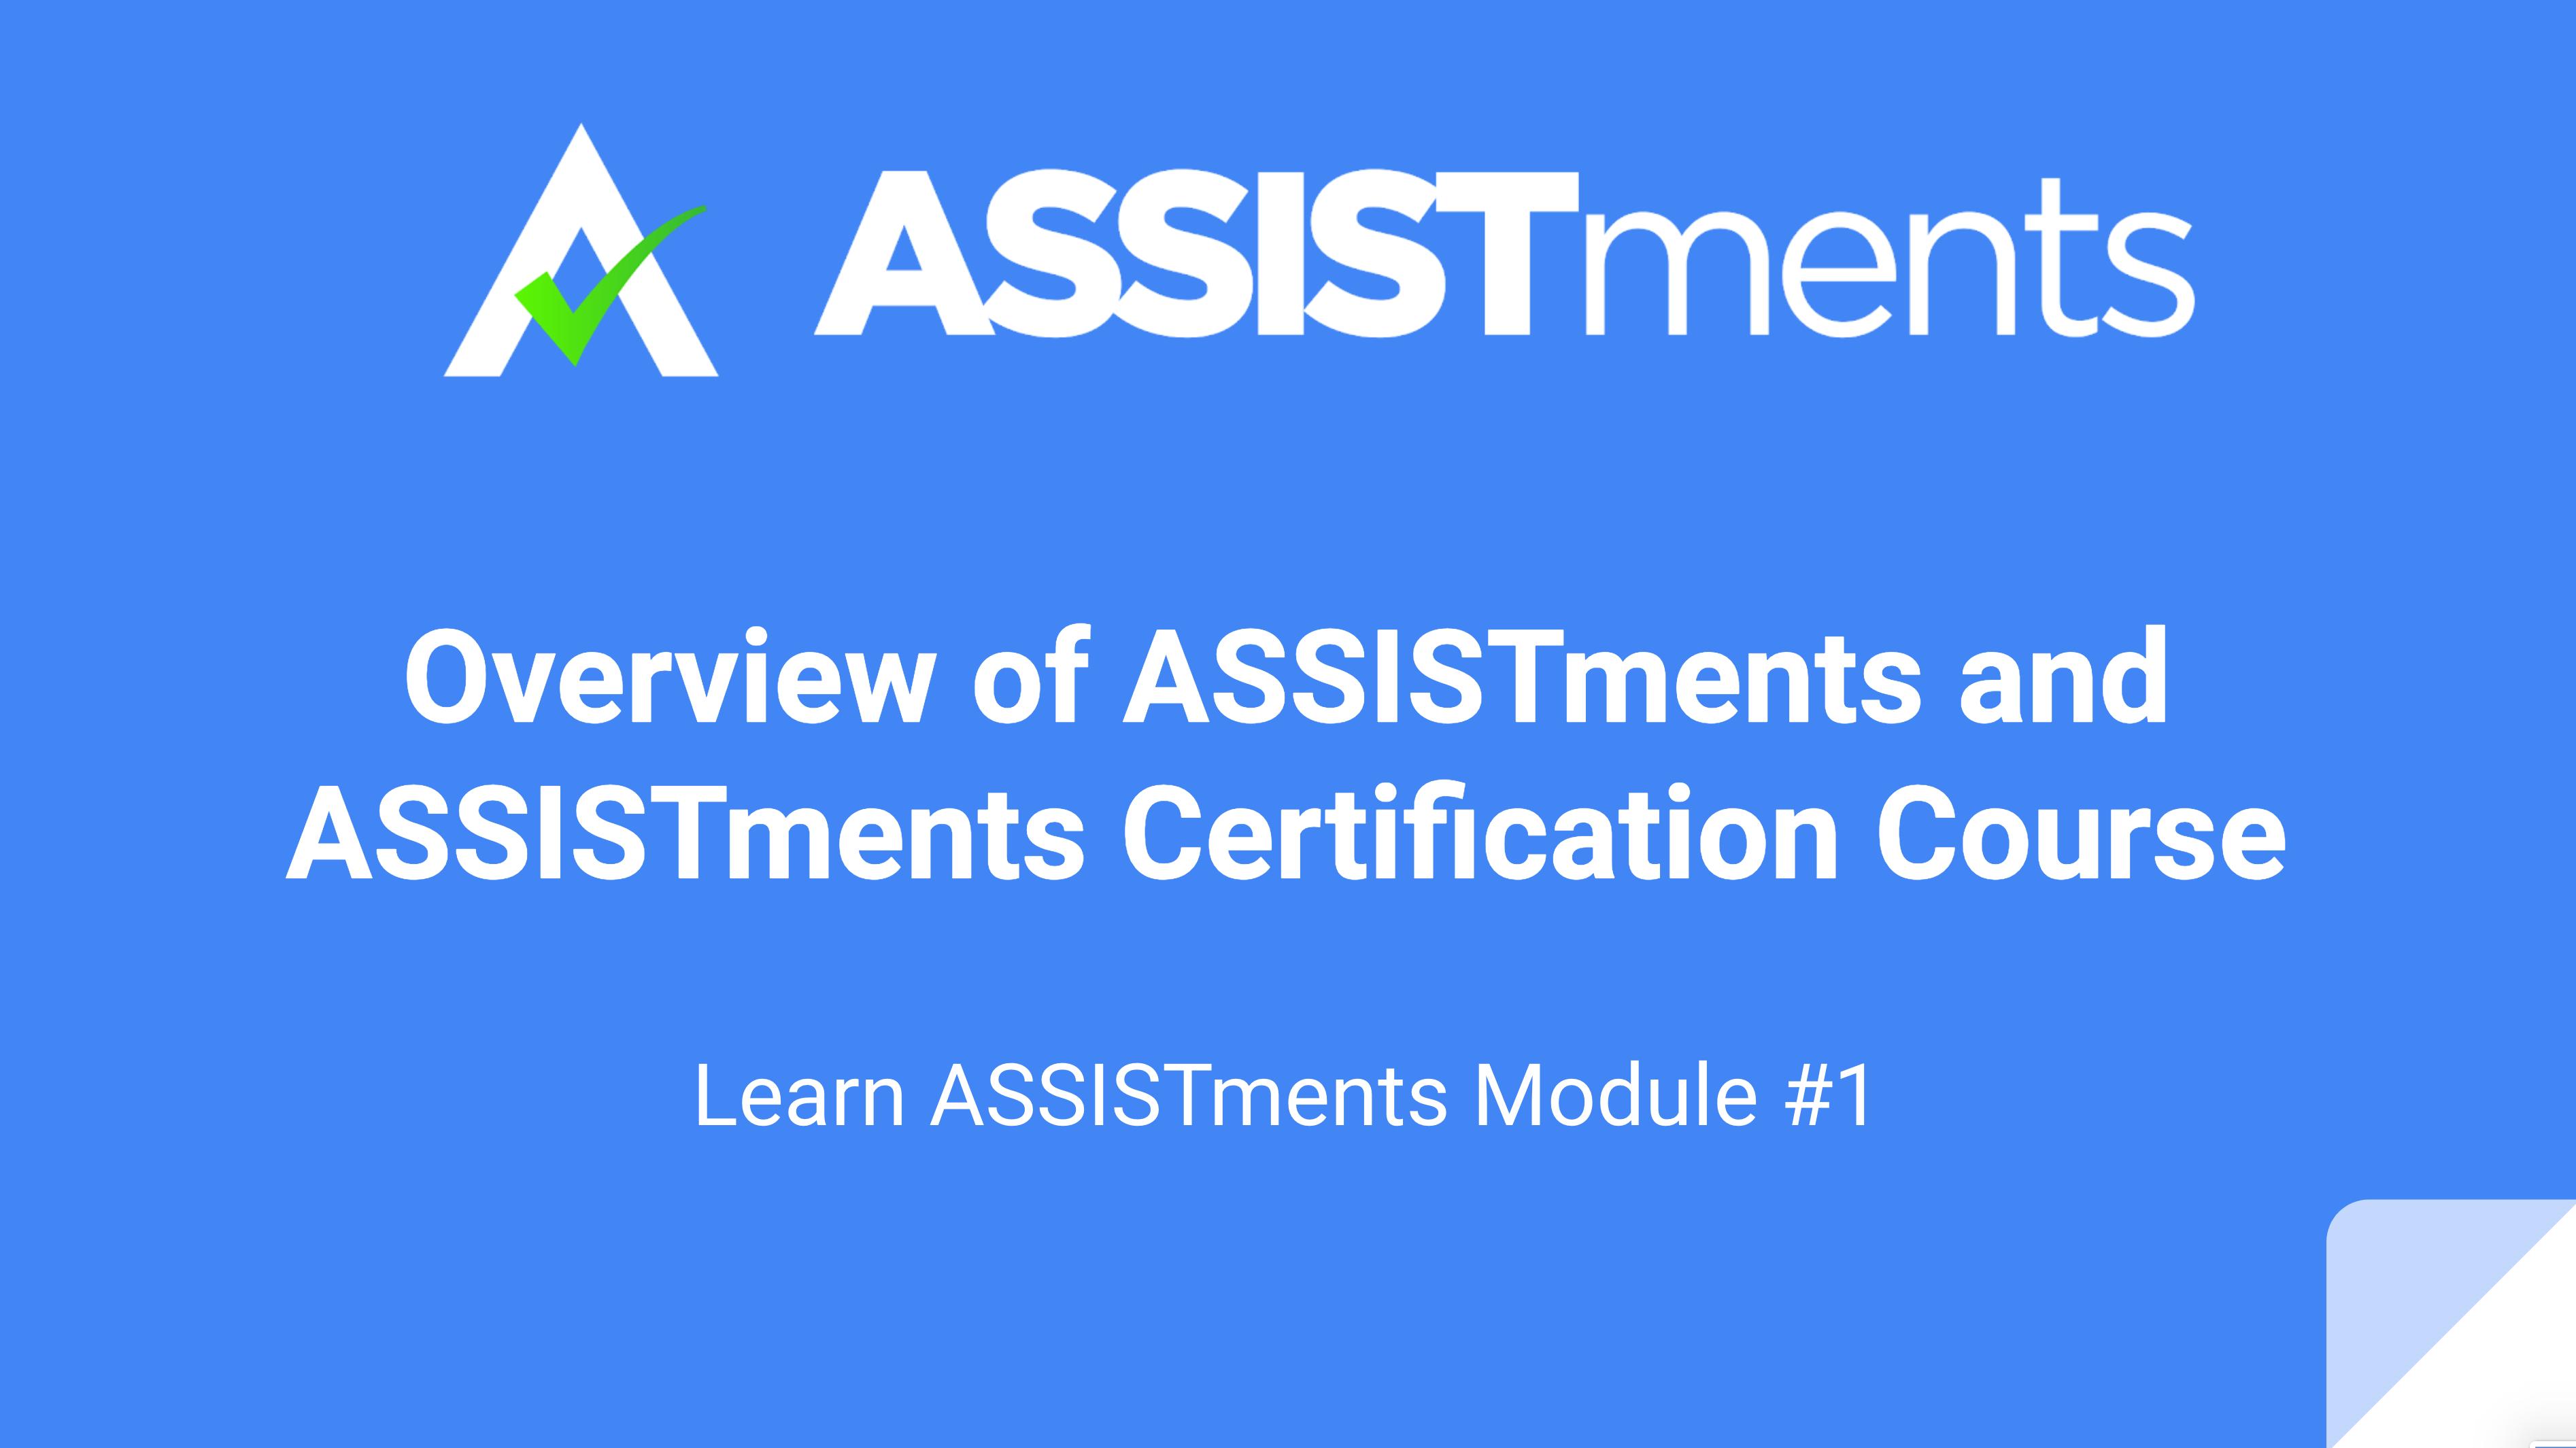 Learn ASSISTments Module #1